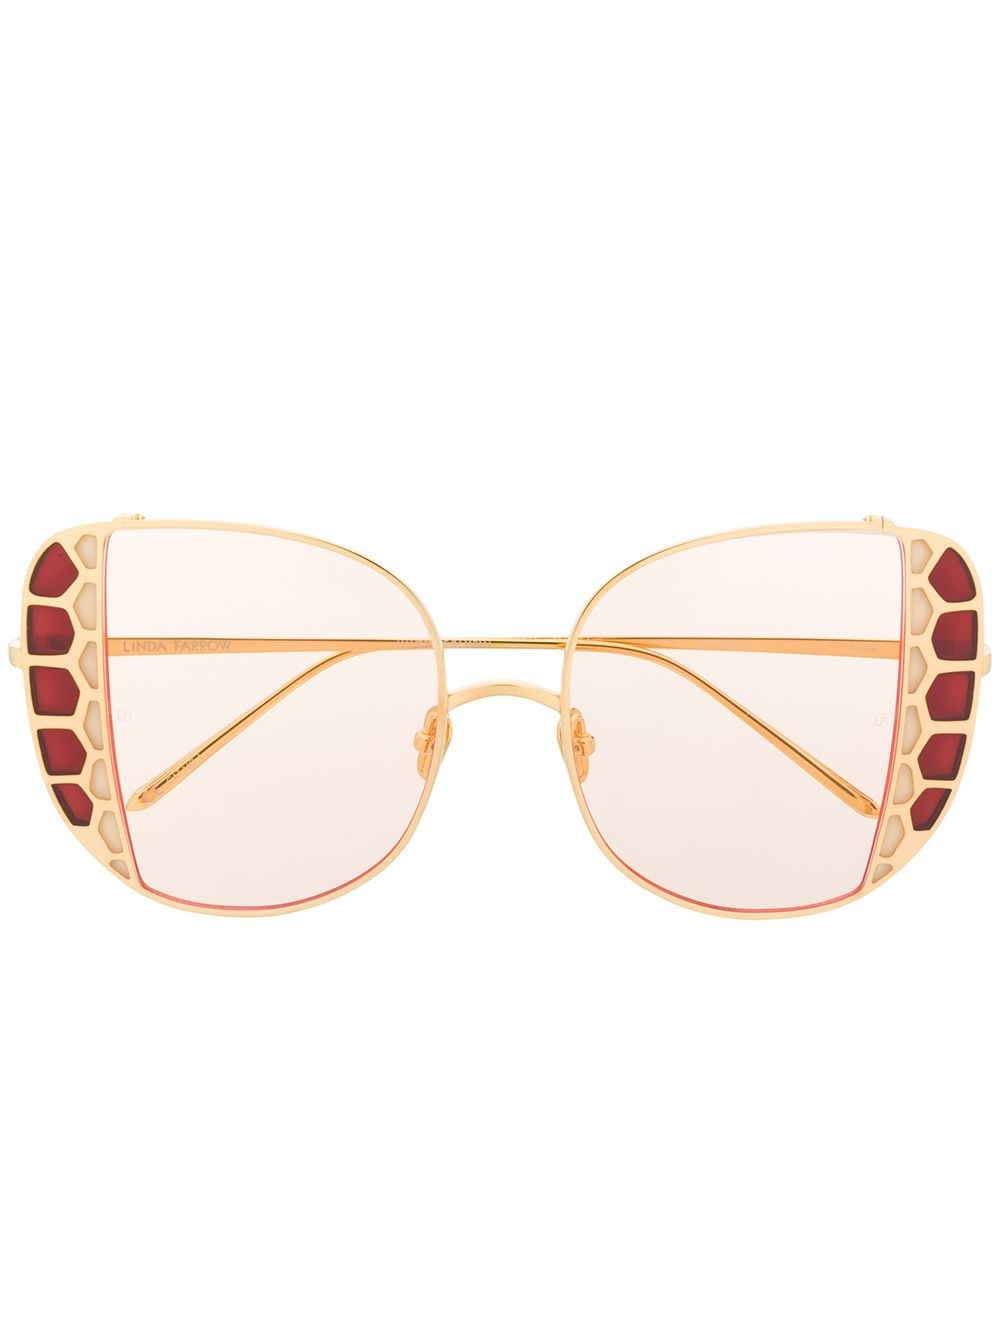 Linda Farrow 'Amelia' Oversized-Sonnenbrille - Gold